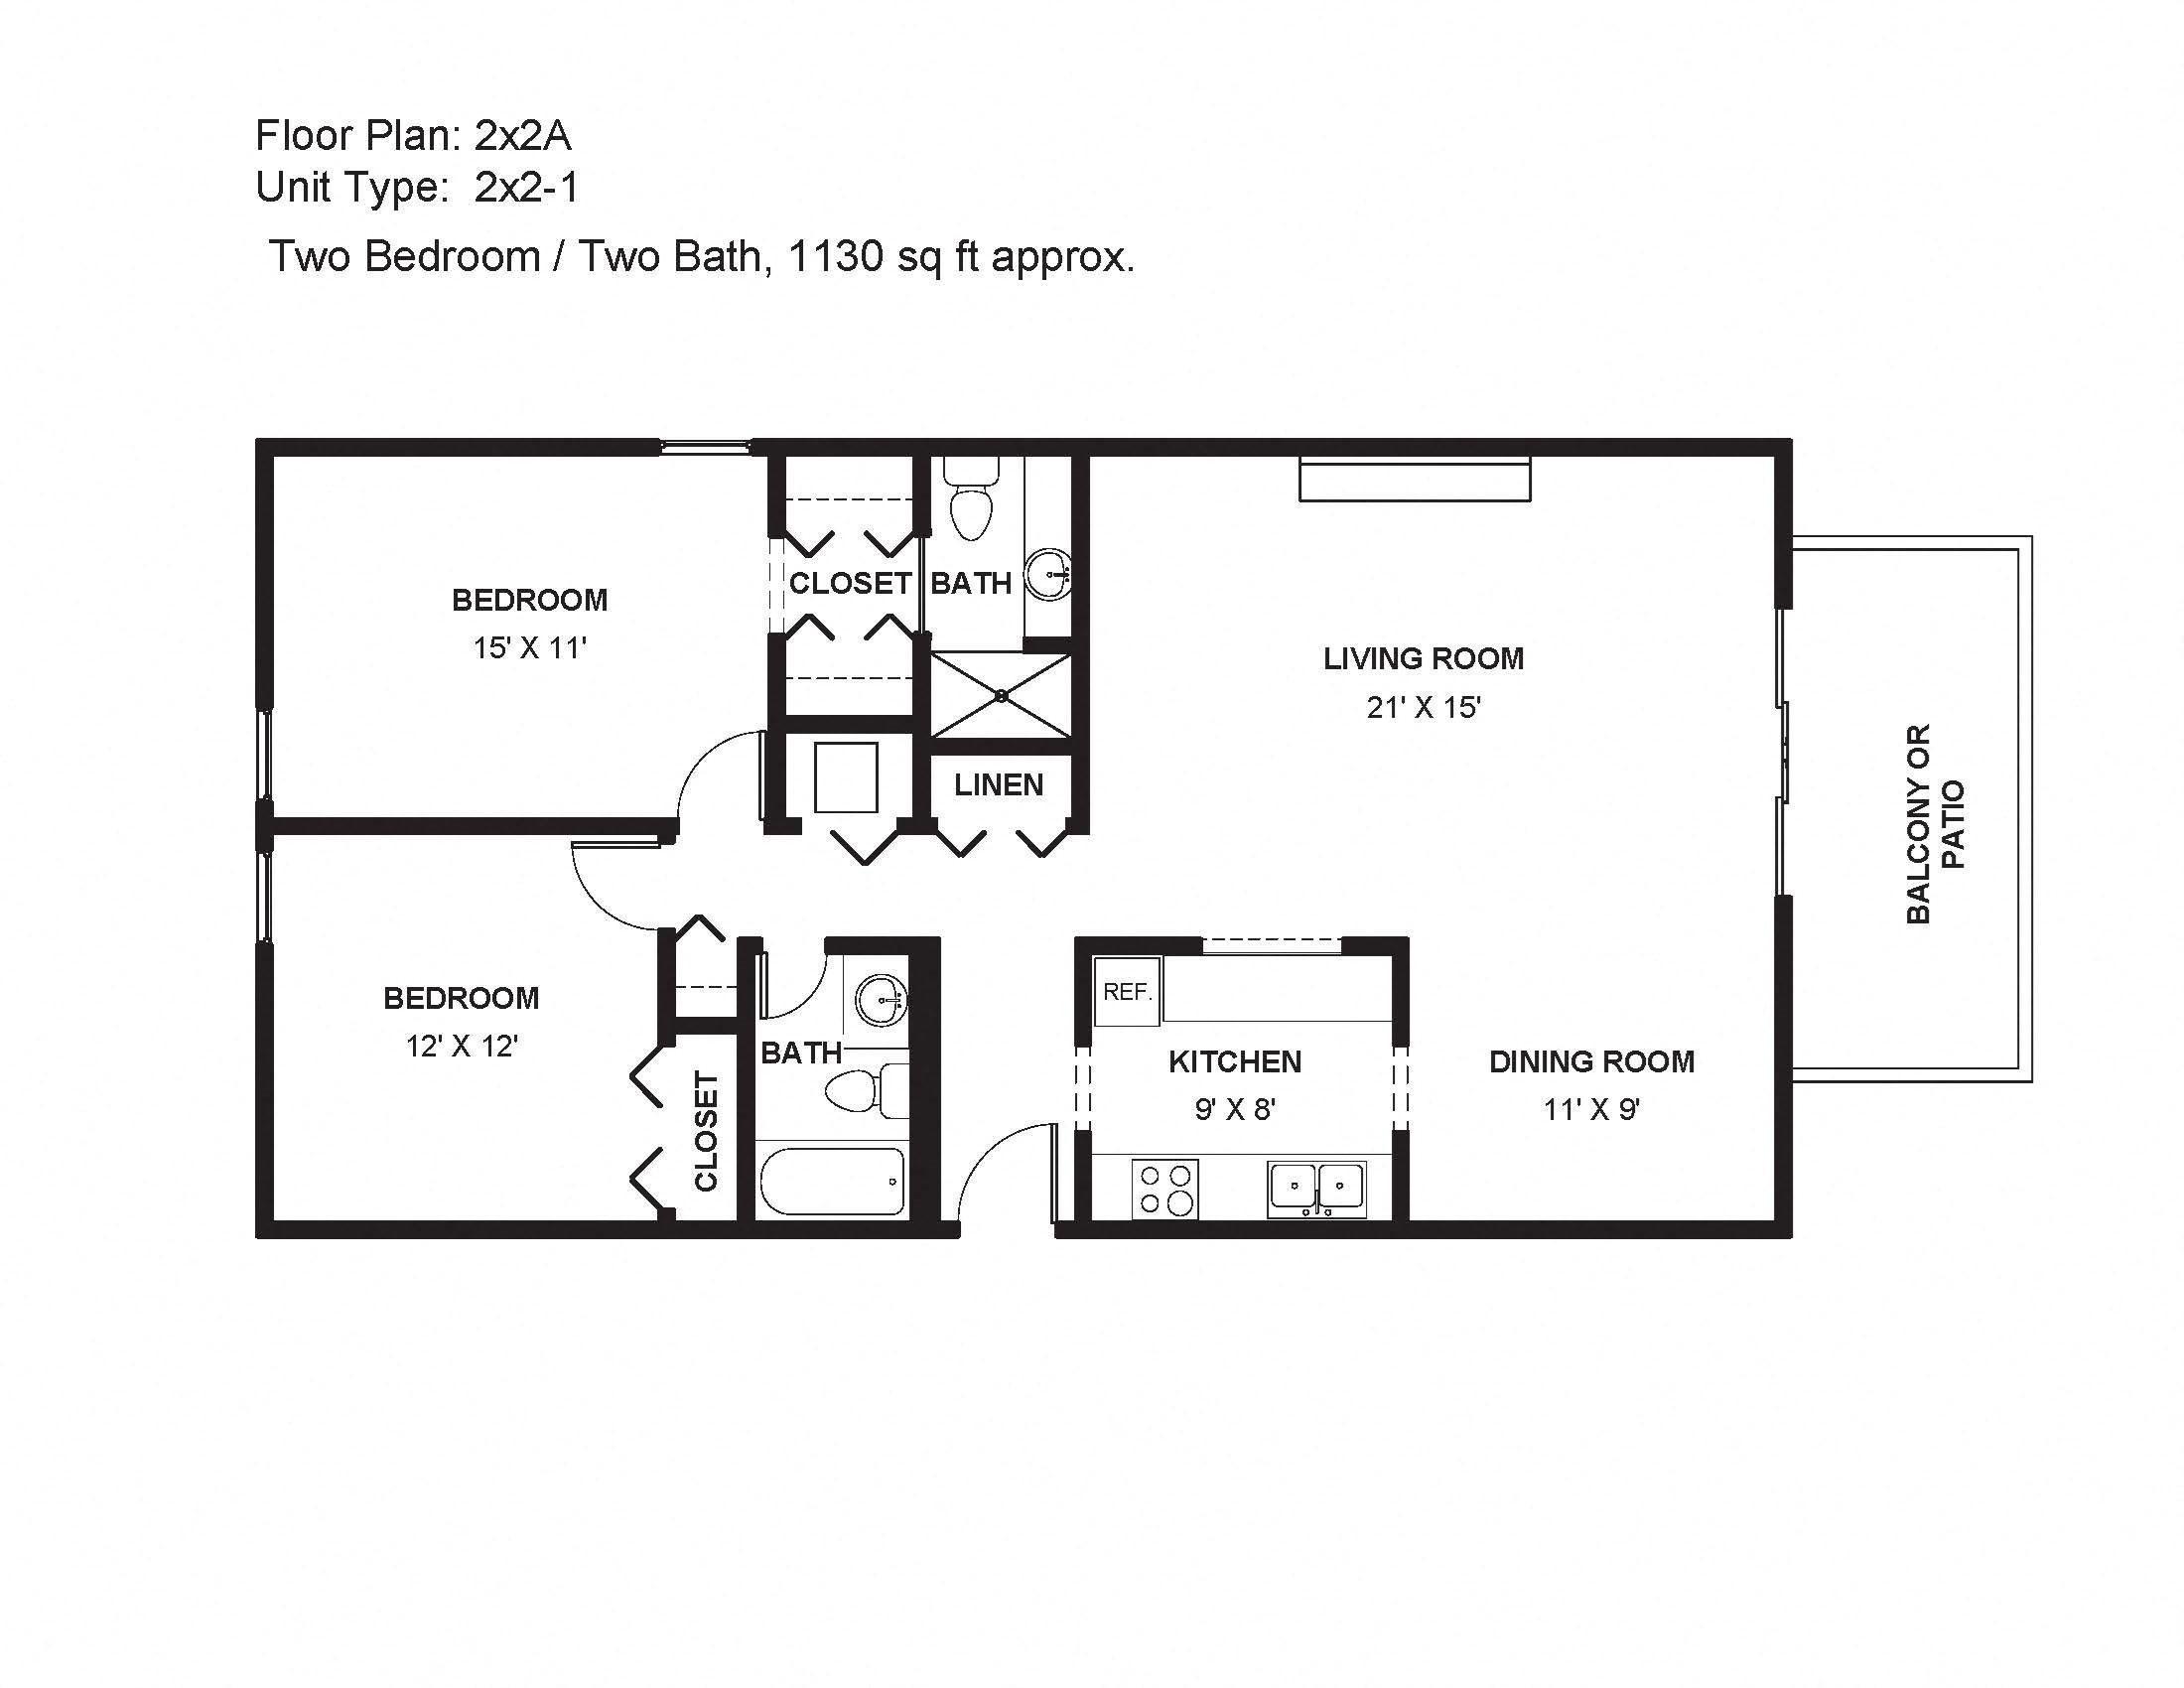 2x2A Floor Plan 7